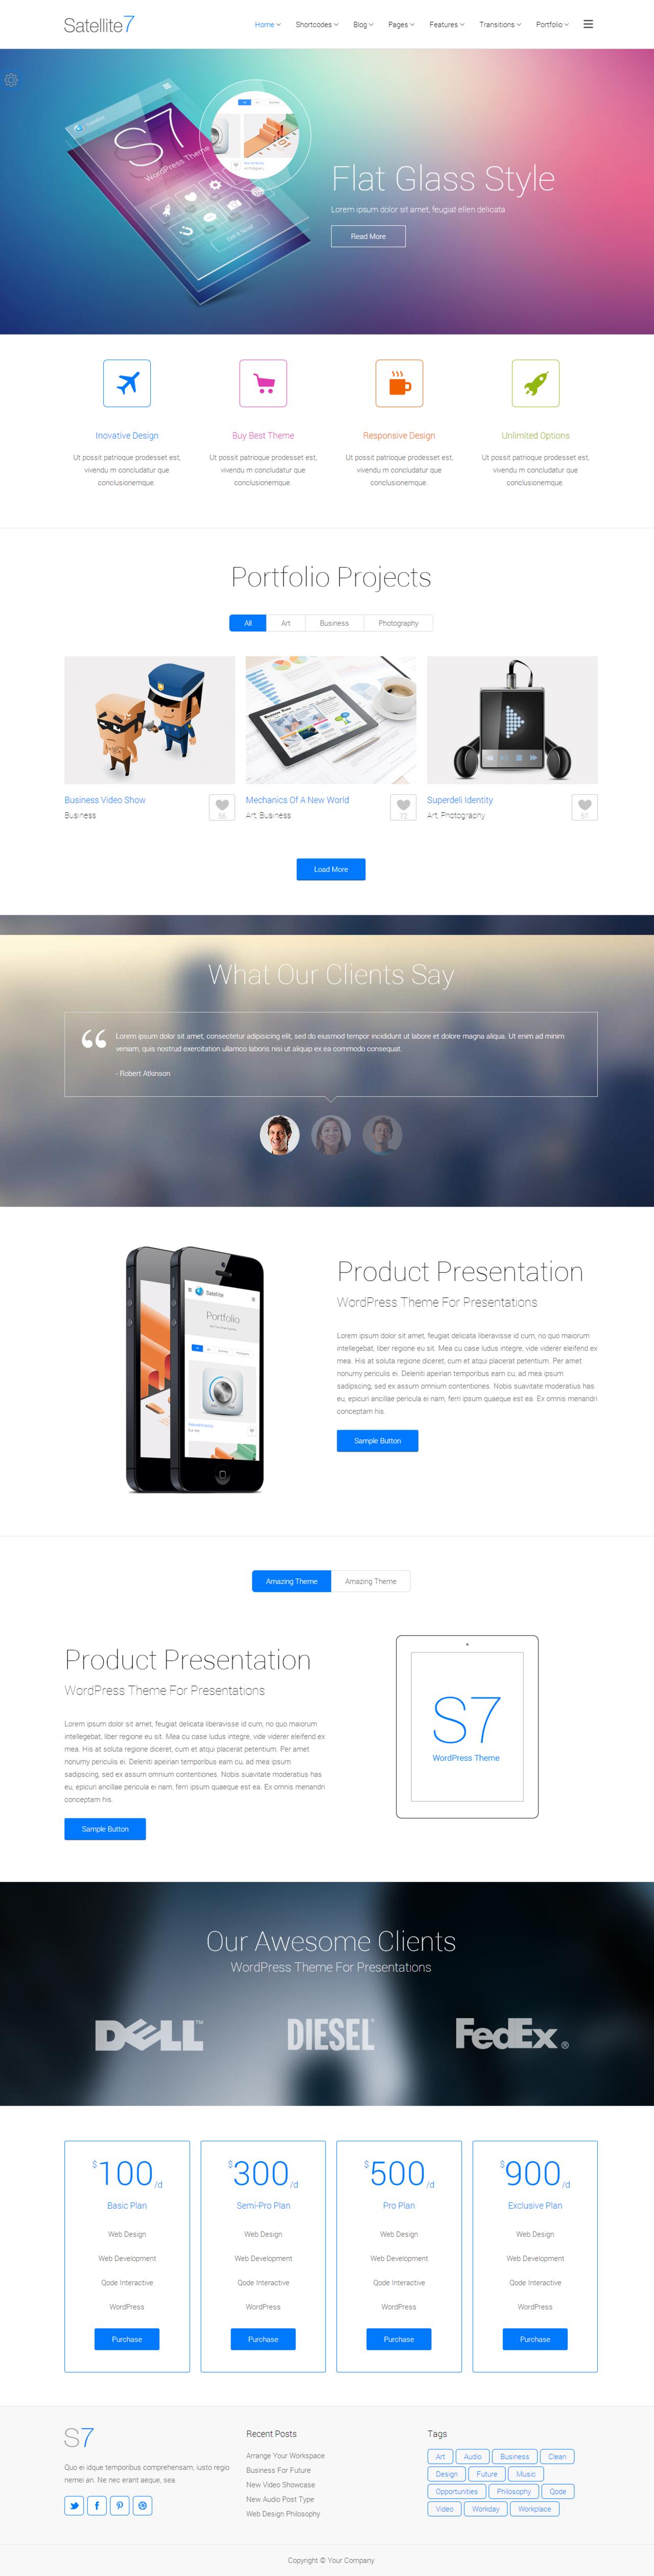 Satellite7 WordPress Theme by wpthemes.deviantart.com on @deviantART #WordPress #theme #template #webdesign